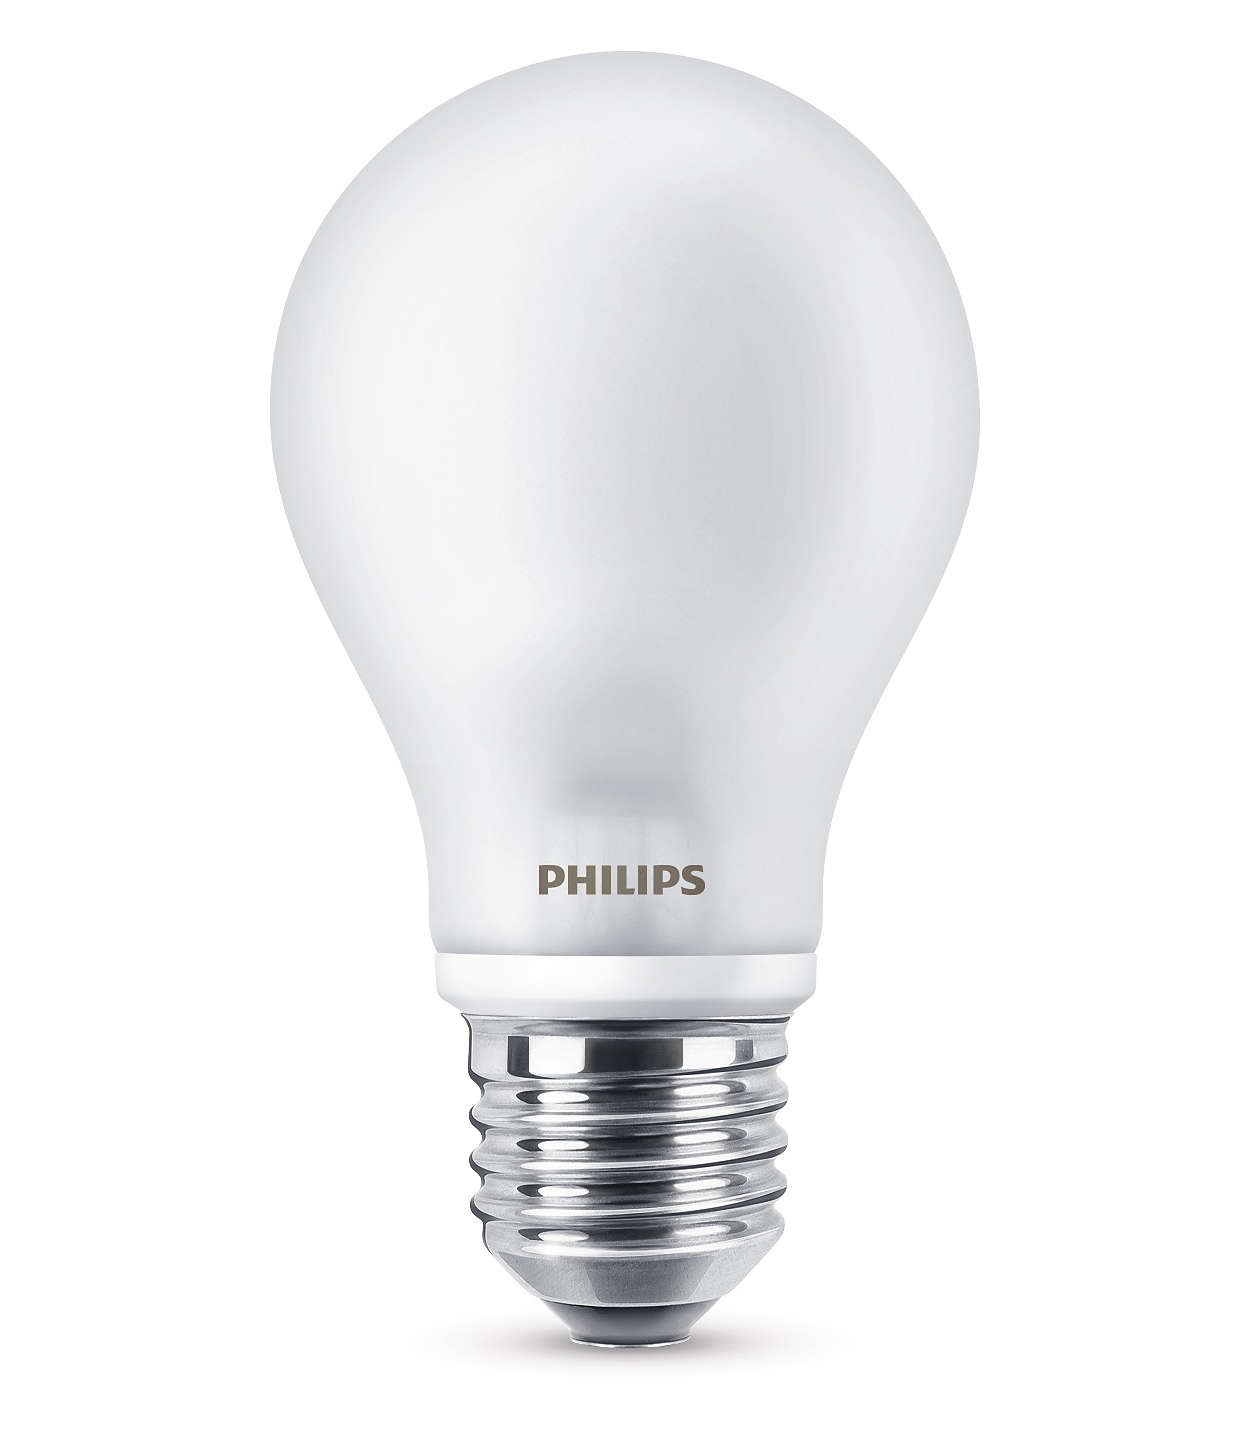 O bir klasik, LED